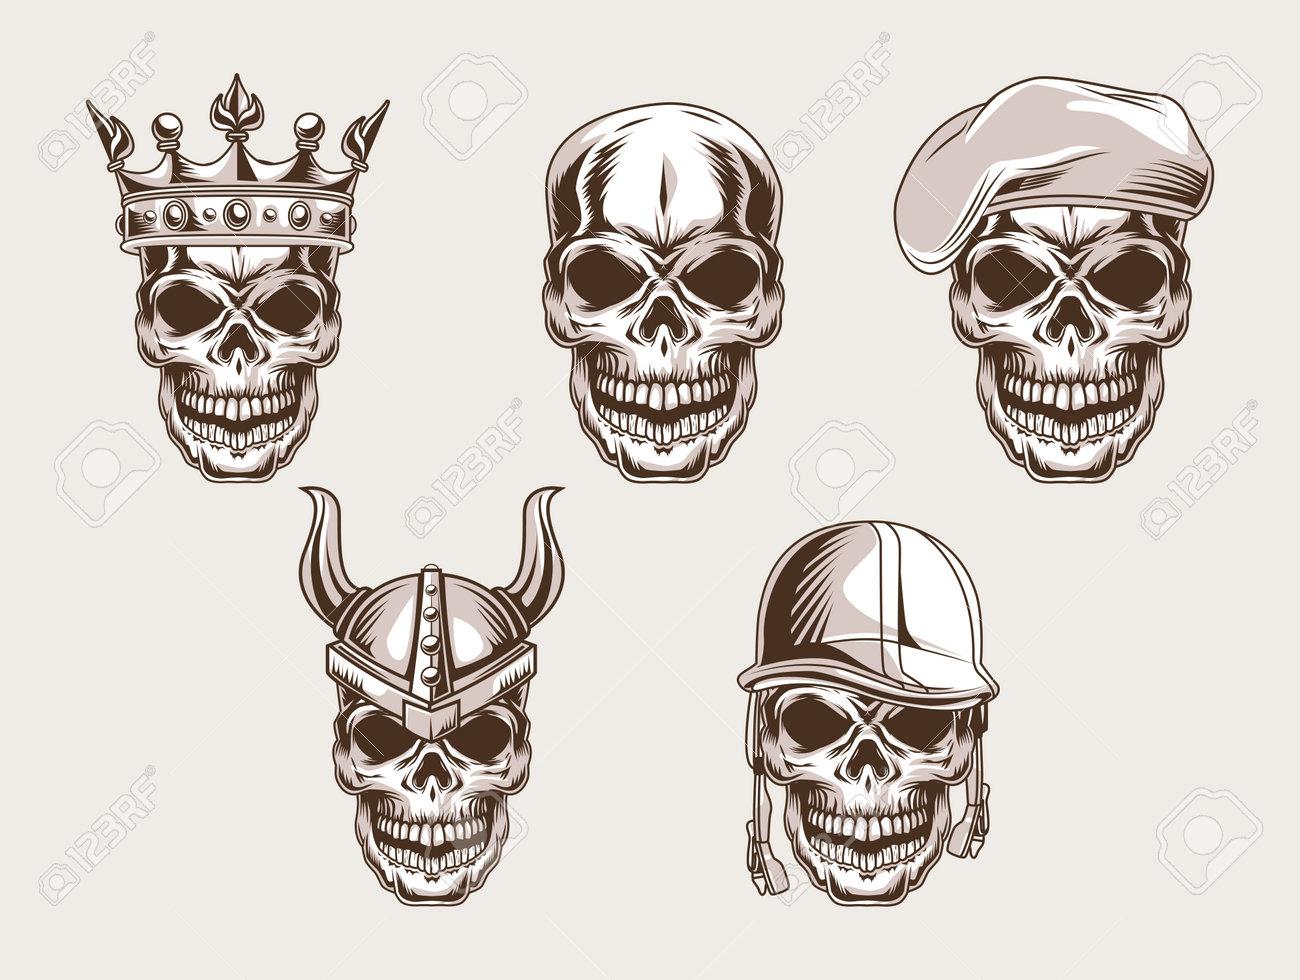 skulls heads set style icon - 165208899